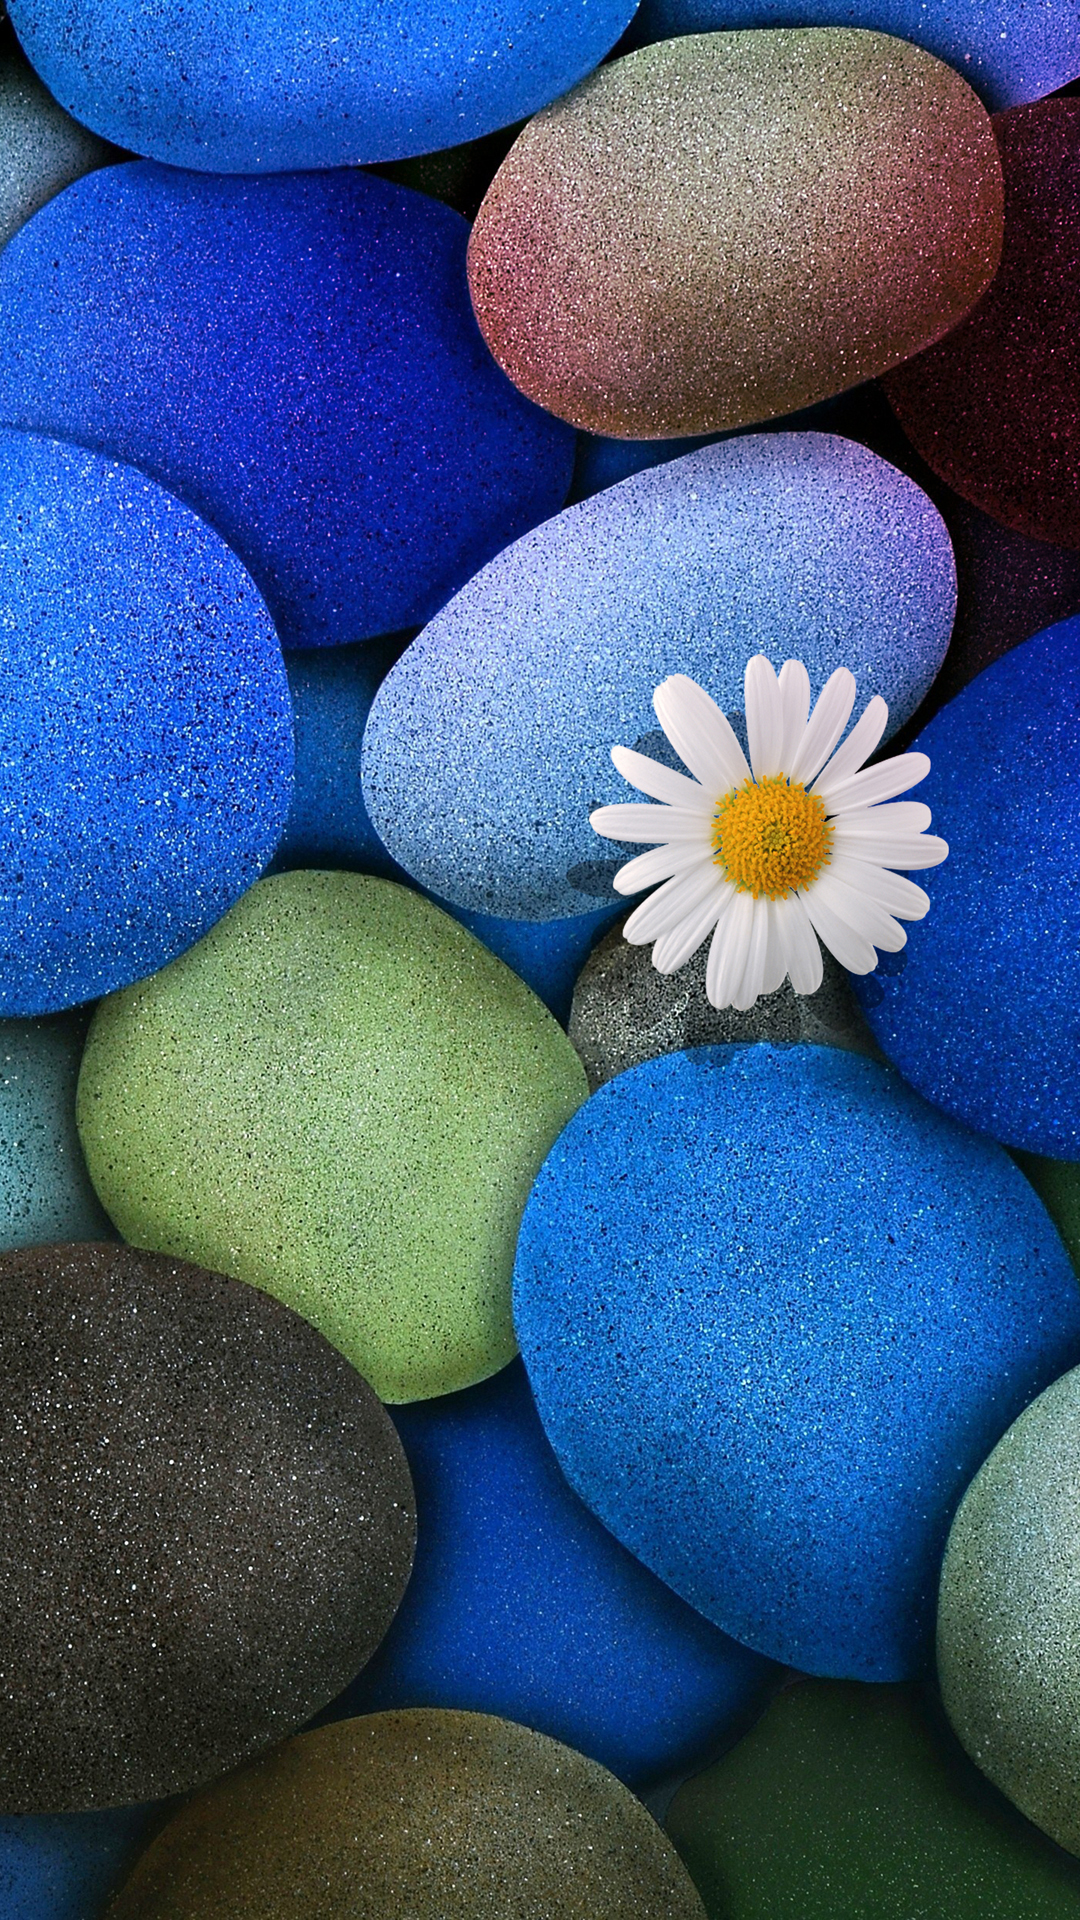 Stone Flower Wallpaper iPhone 6S Plus by DeviantSith17